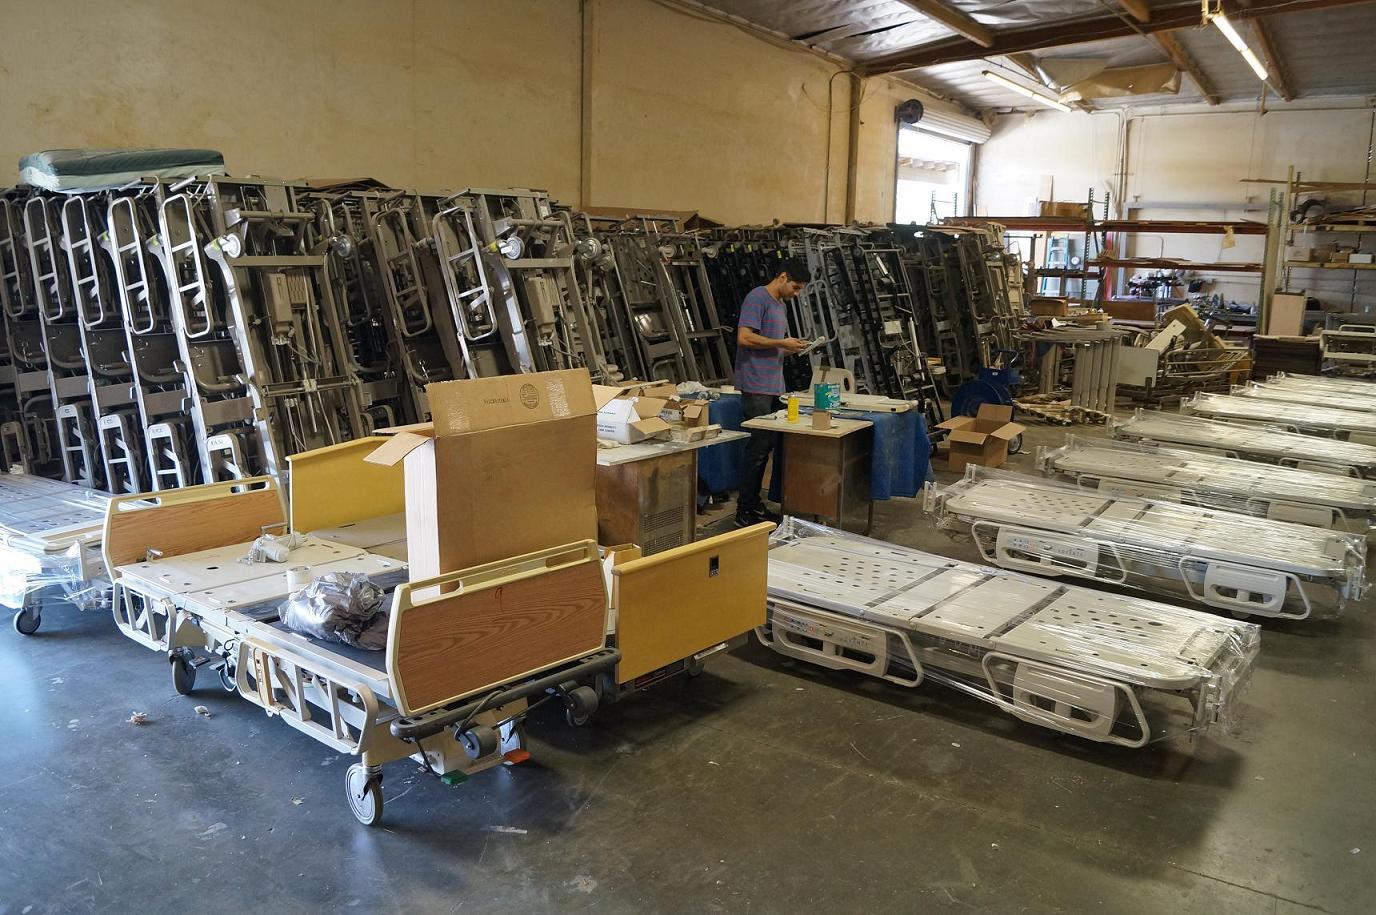 Hill Rom Advance Hill Rom P1600 Advanta Hospital Beds For